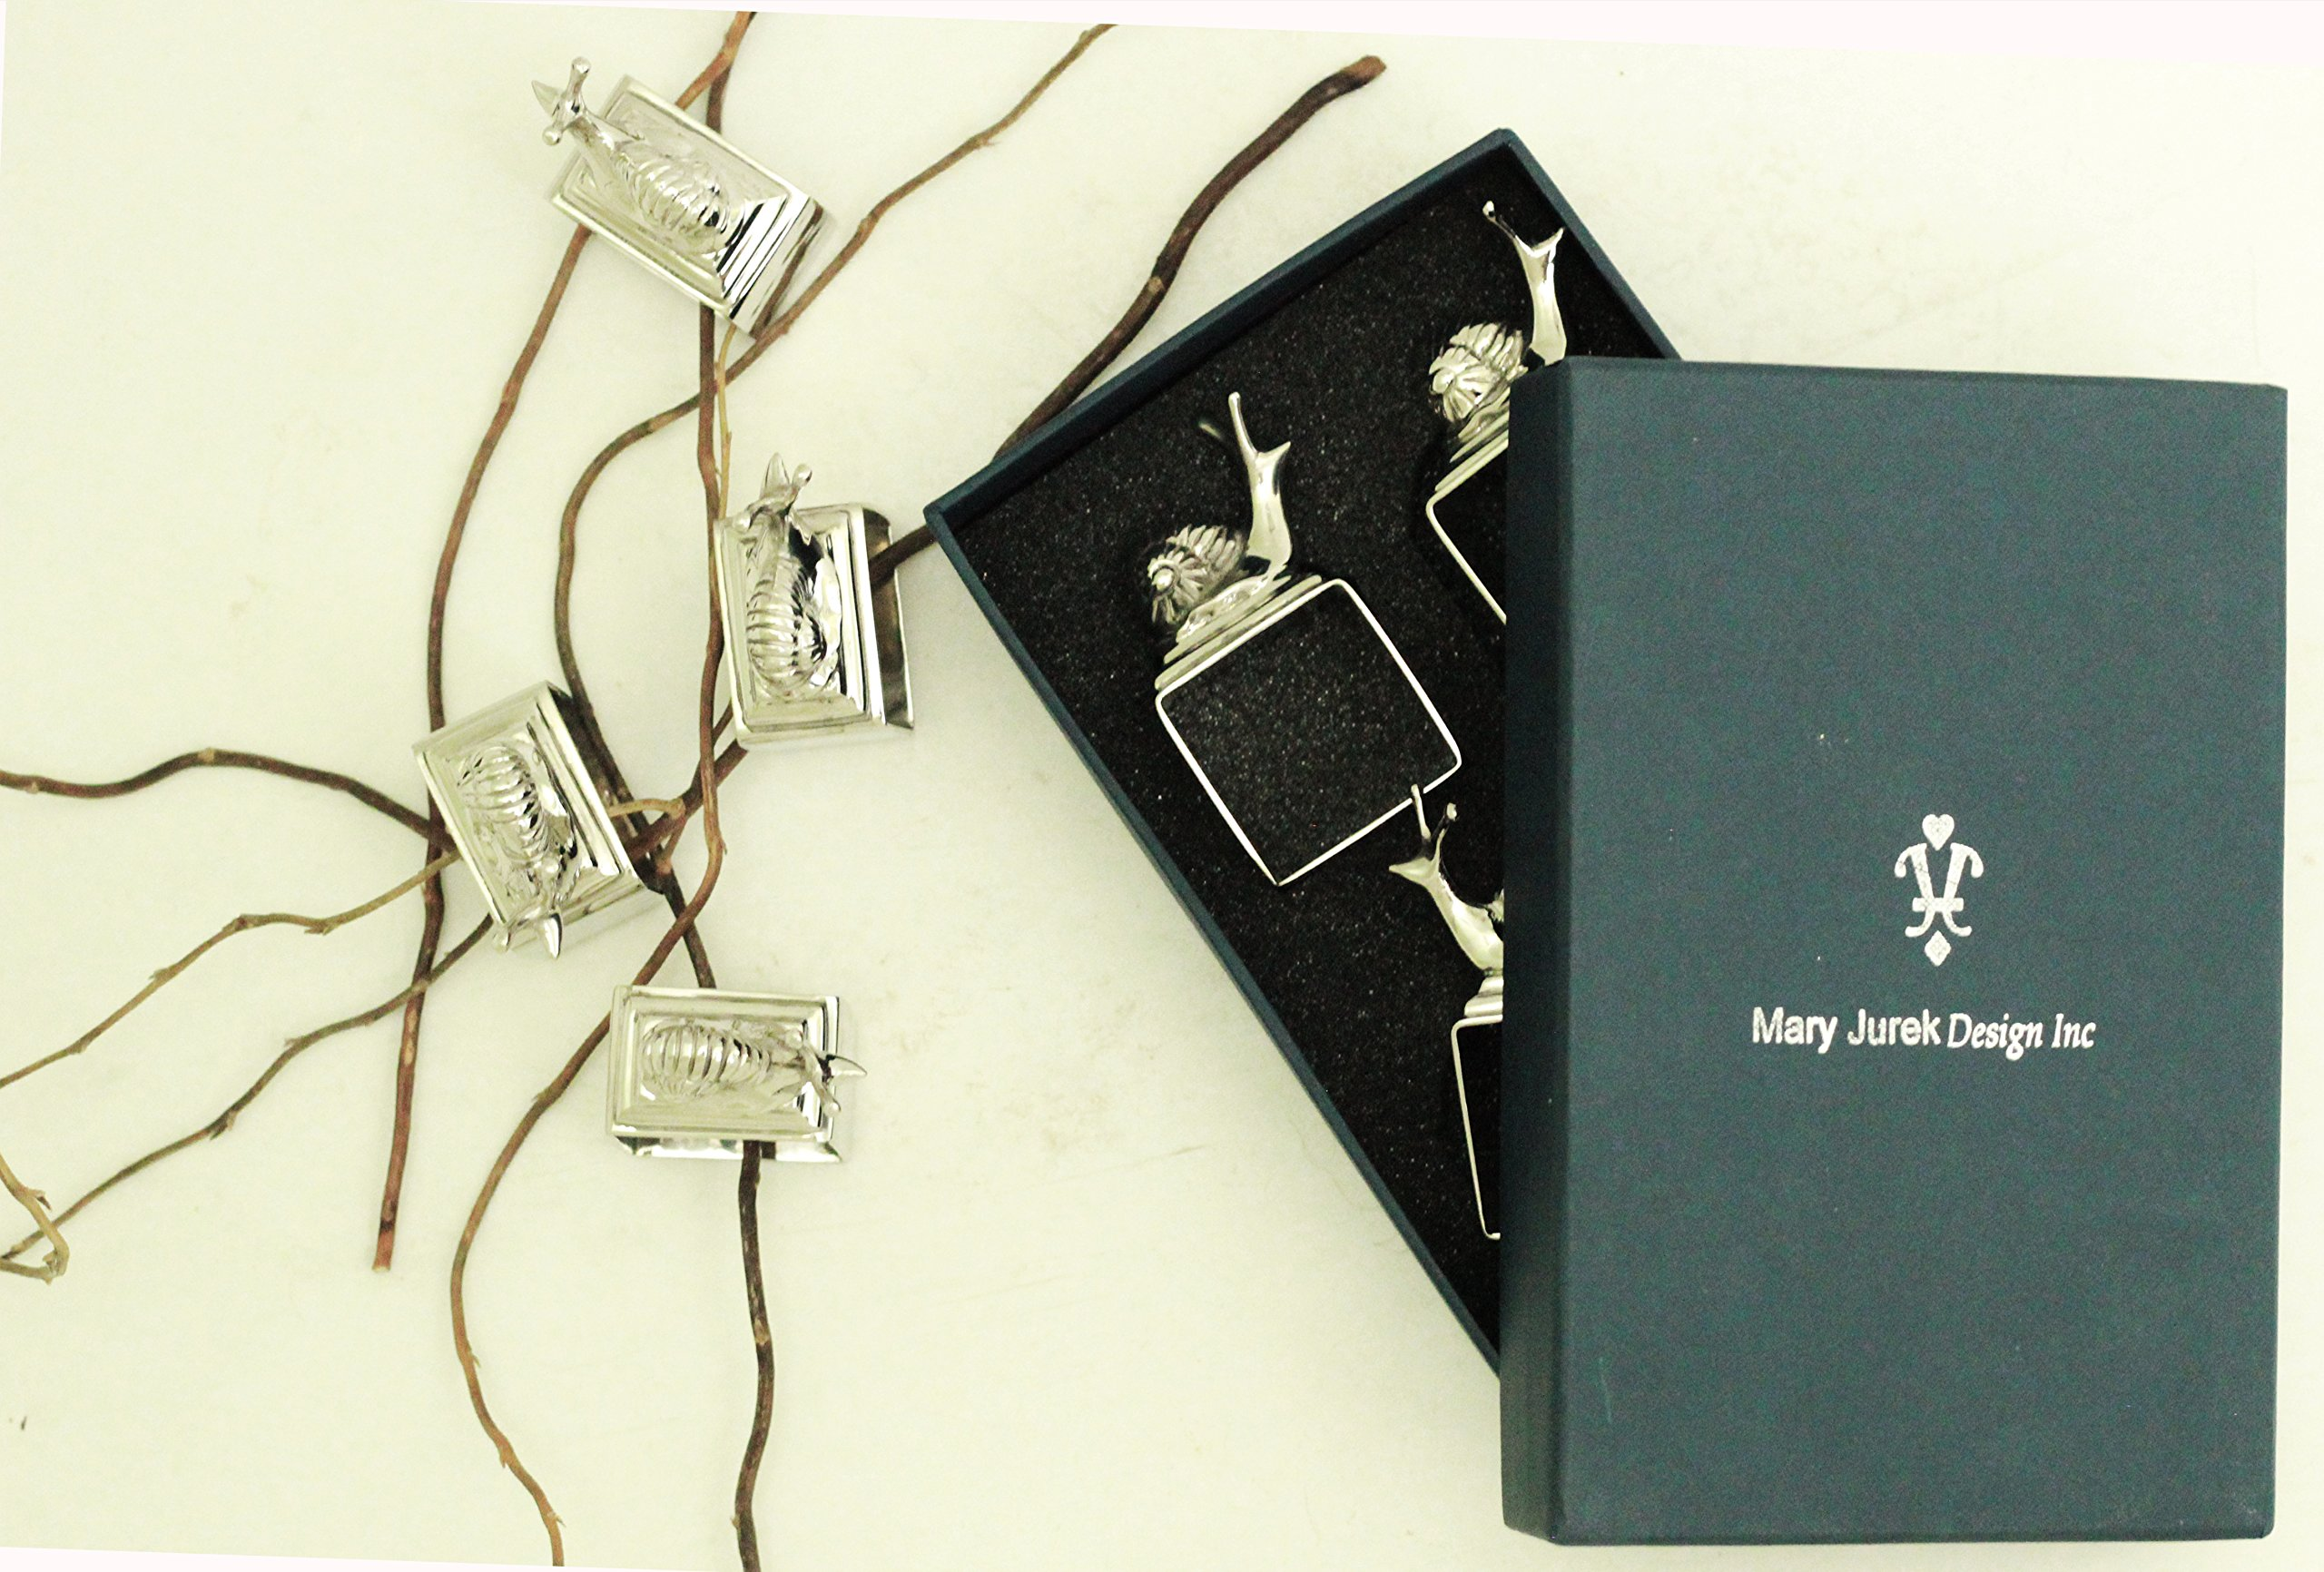 Mary Jurek Design Animal Collection Snail Napkin Rings | Set of 4